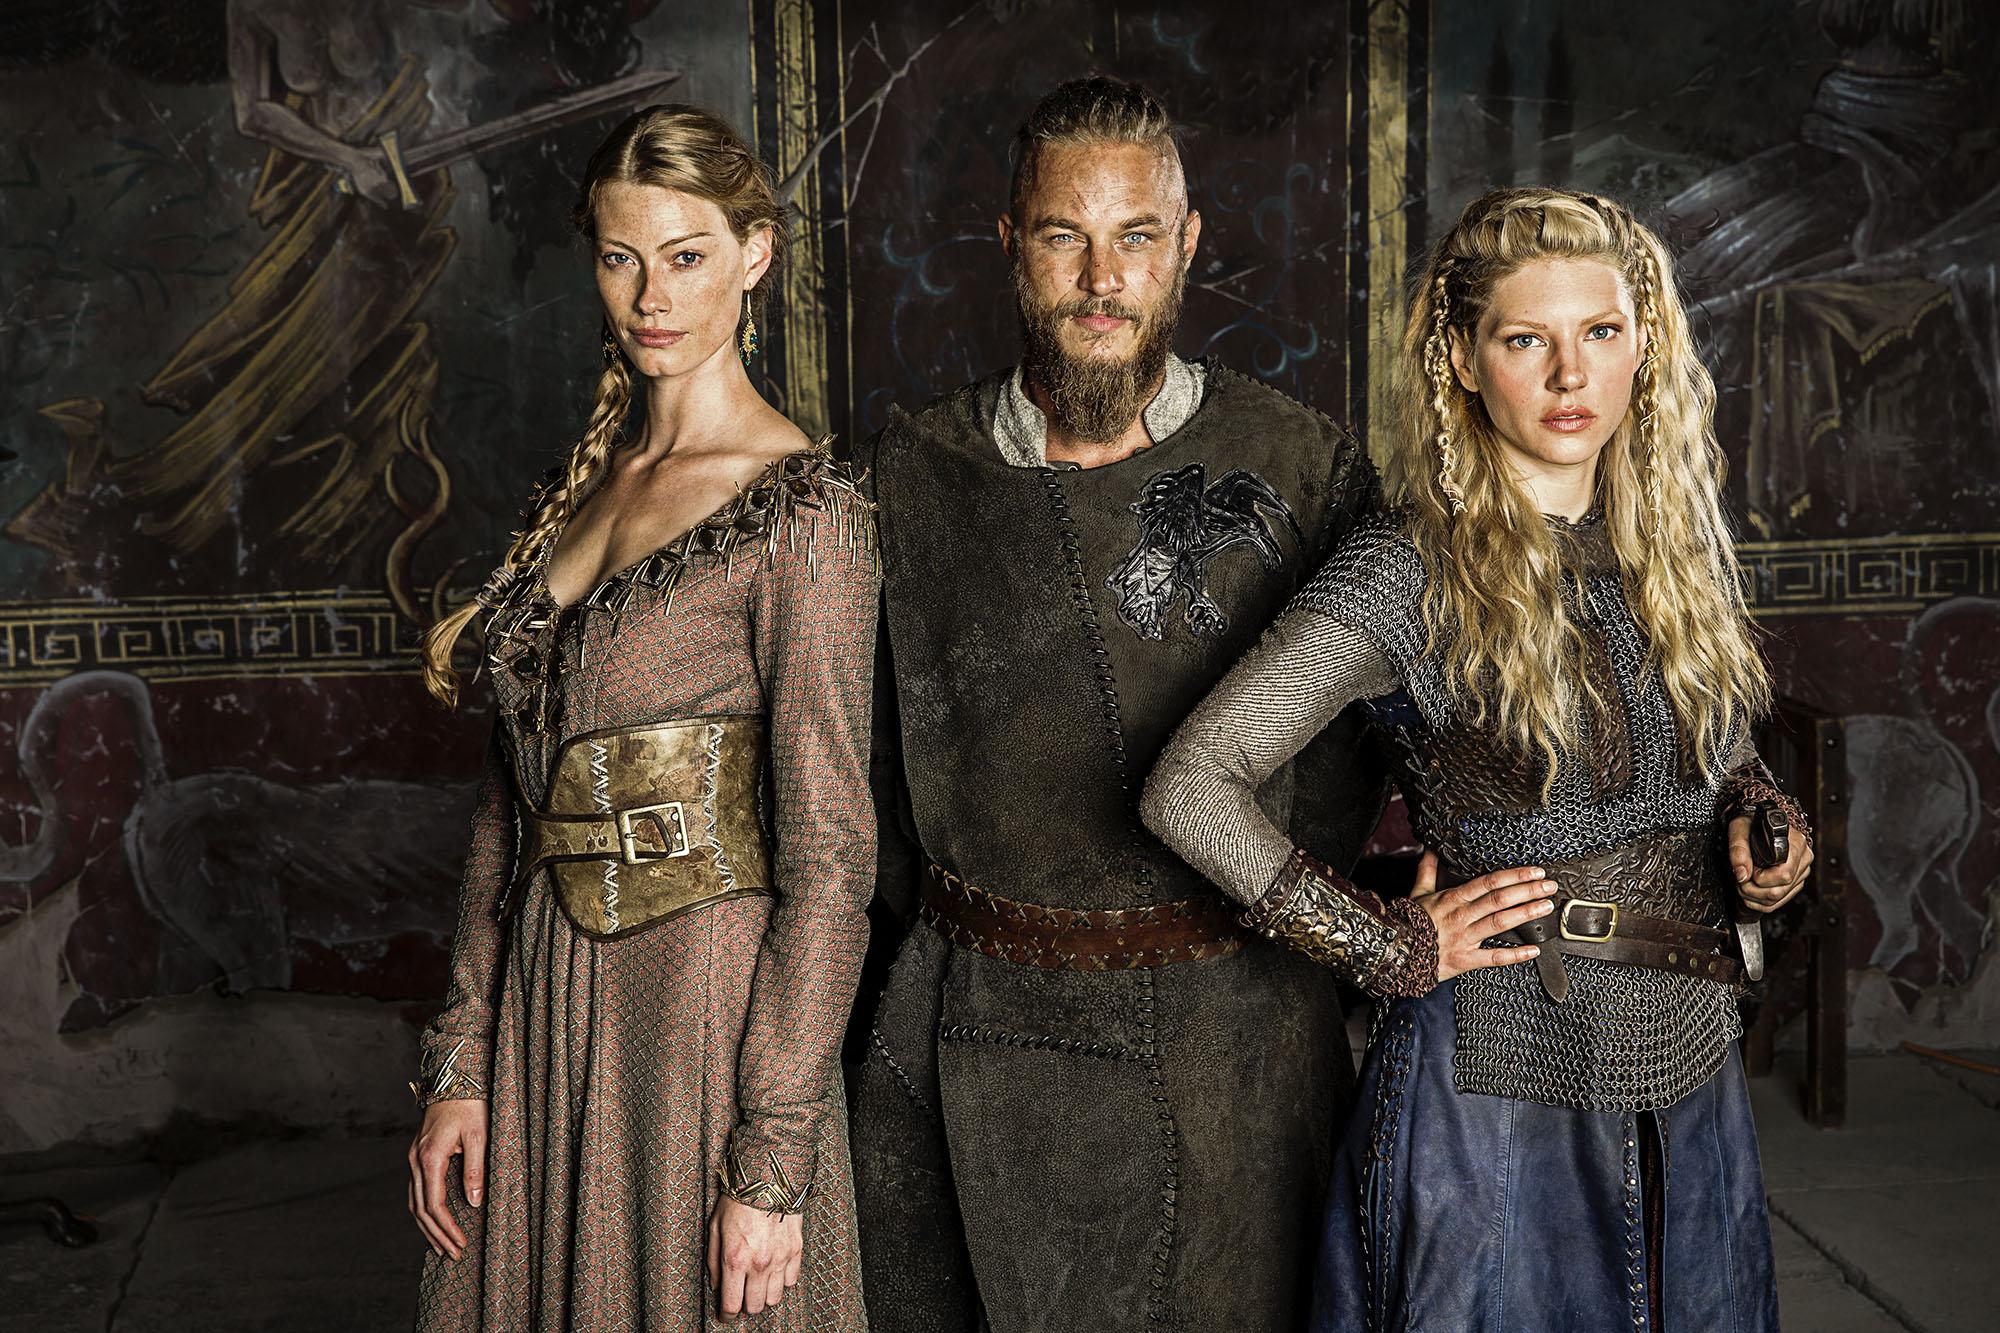 Top Vikings Show Wallpaper Tv Images for Pinterest 2000x1333